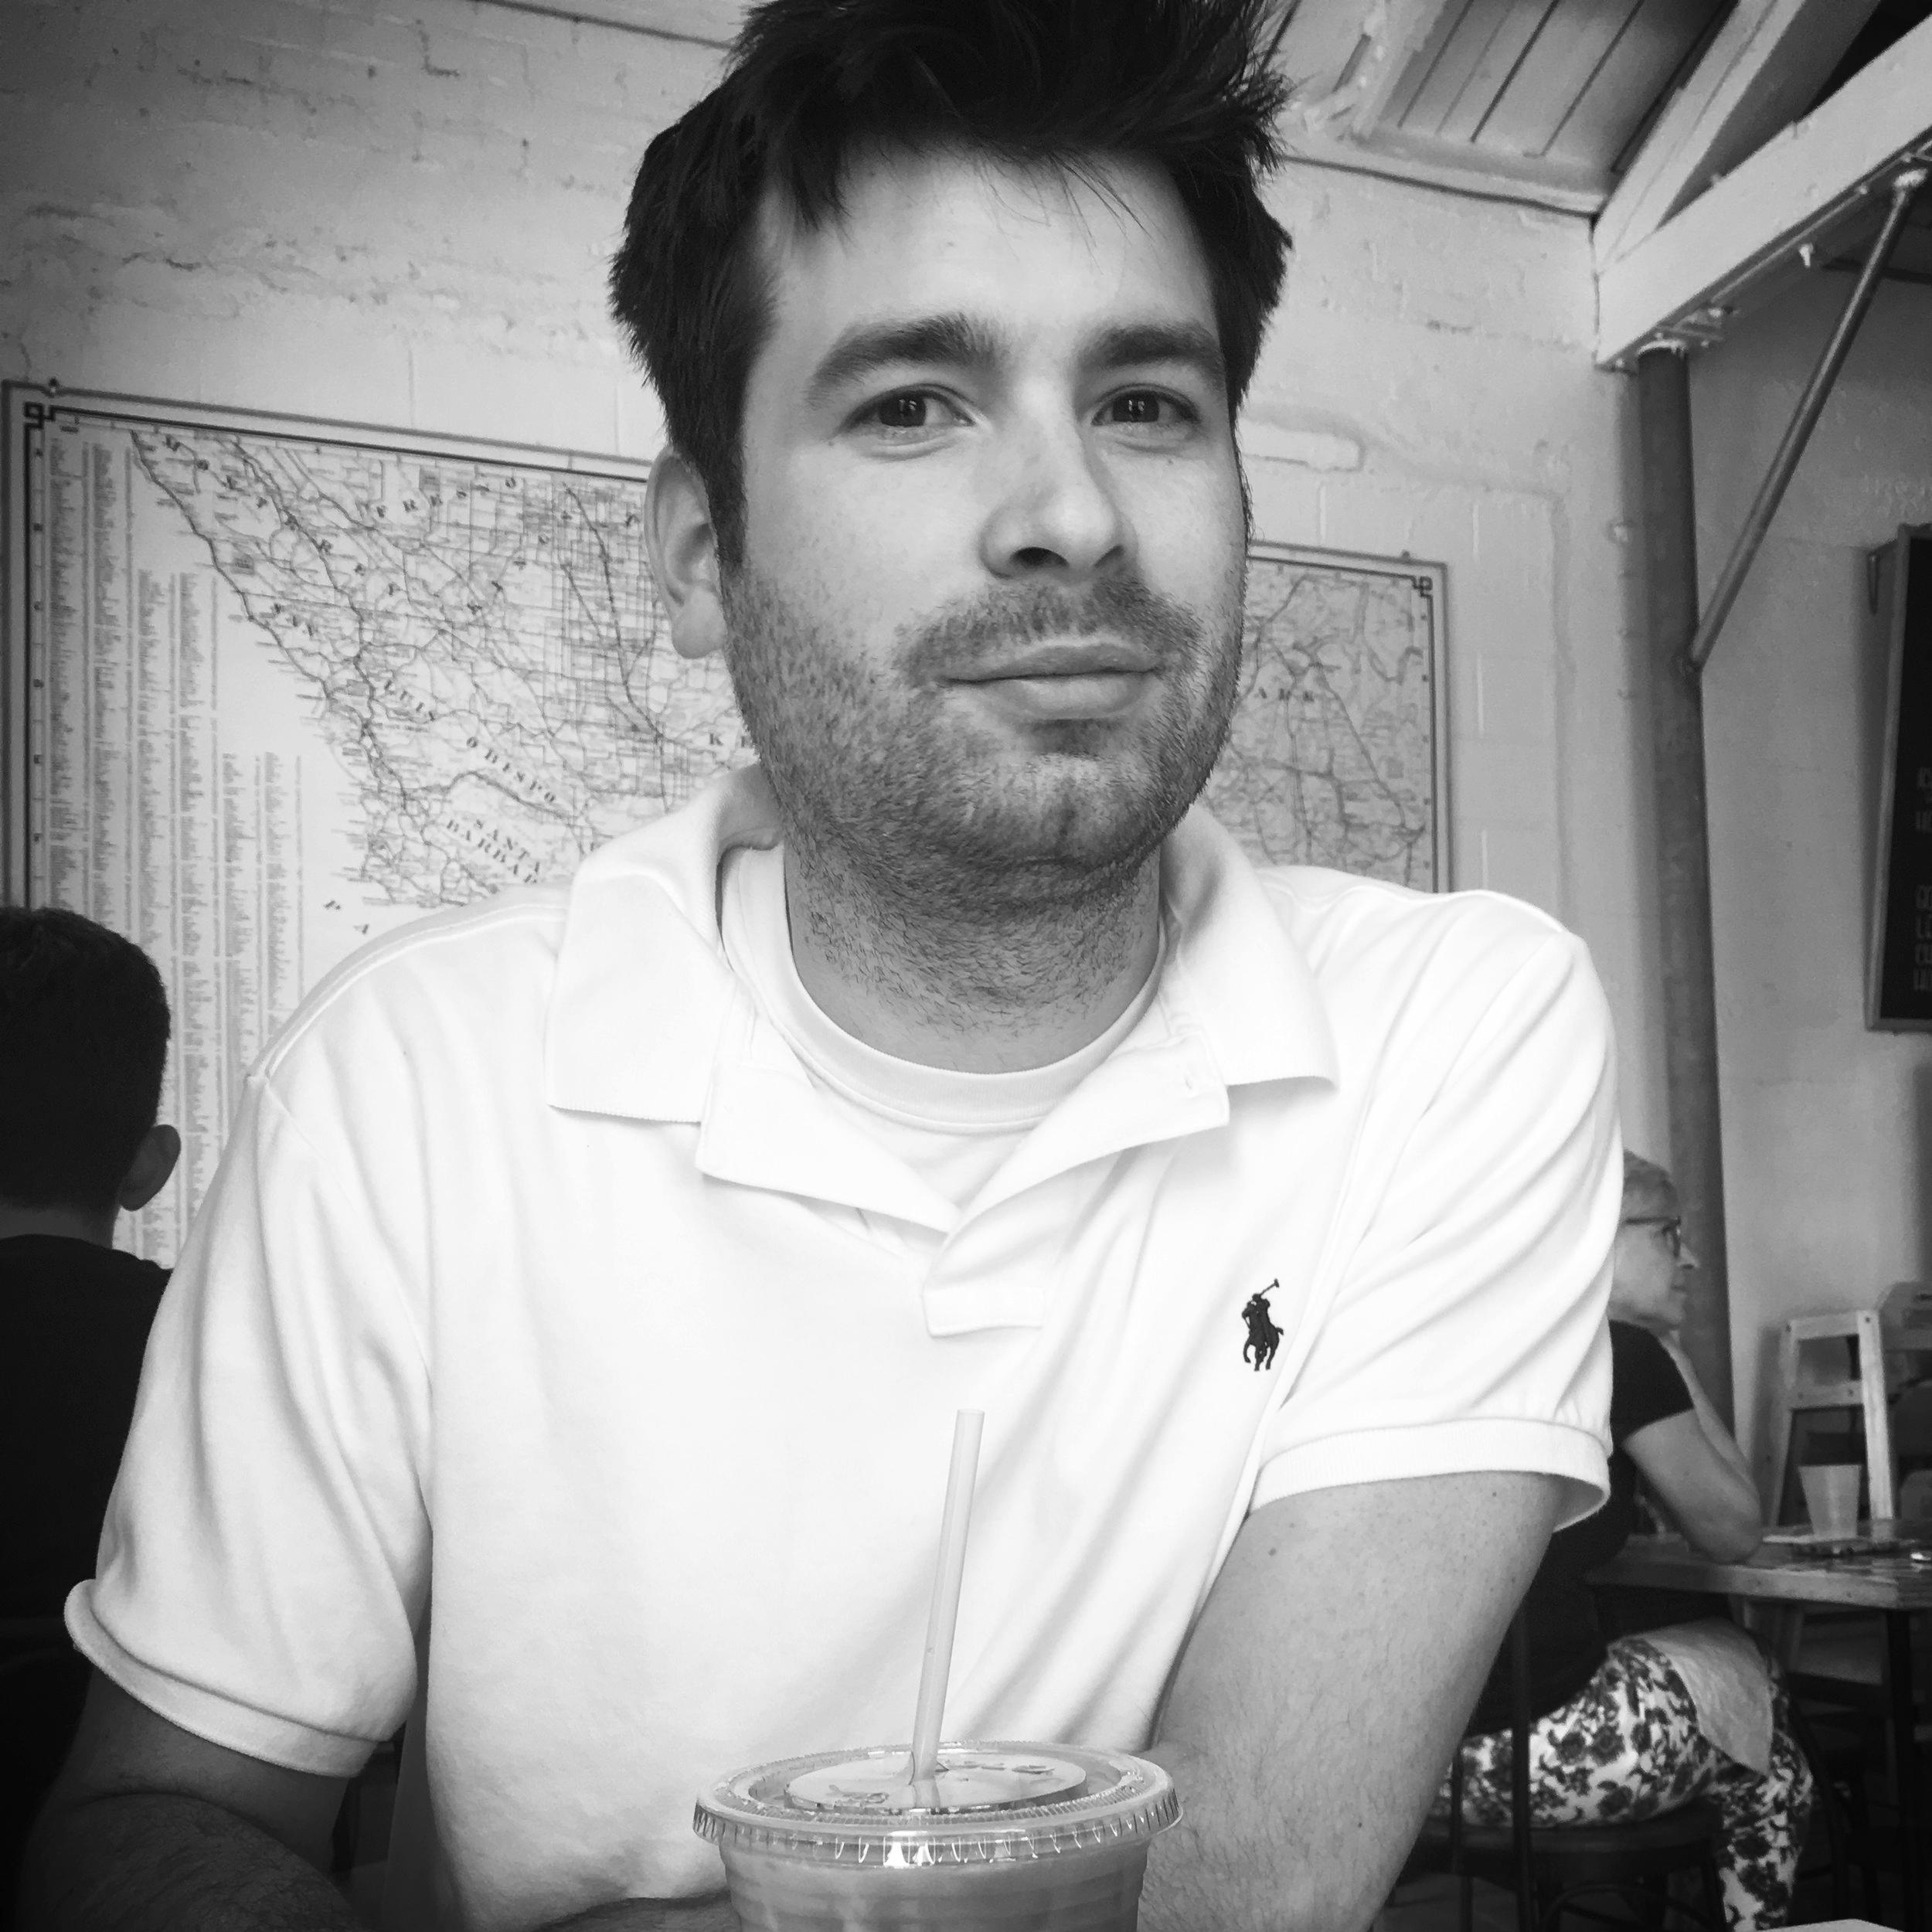 Greg Murray - Aaron met Greg while writing on Big Love. No relation to Ben.